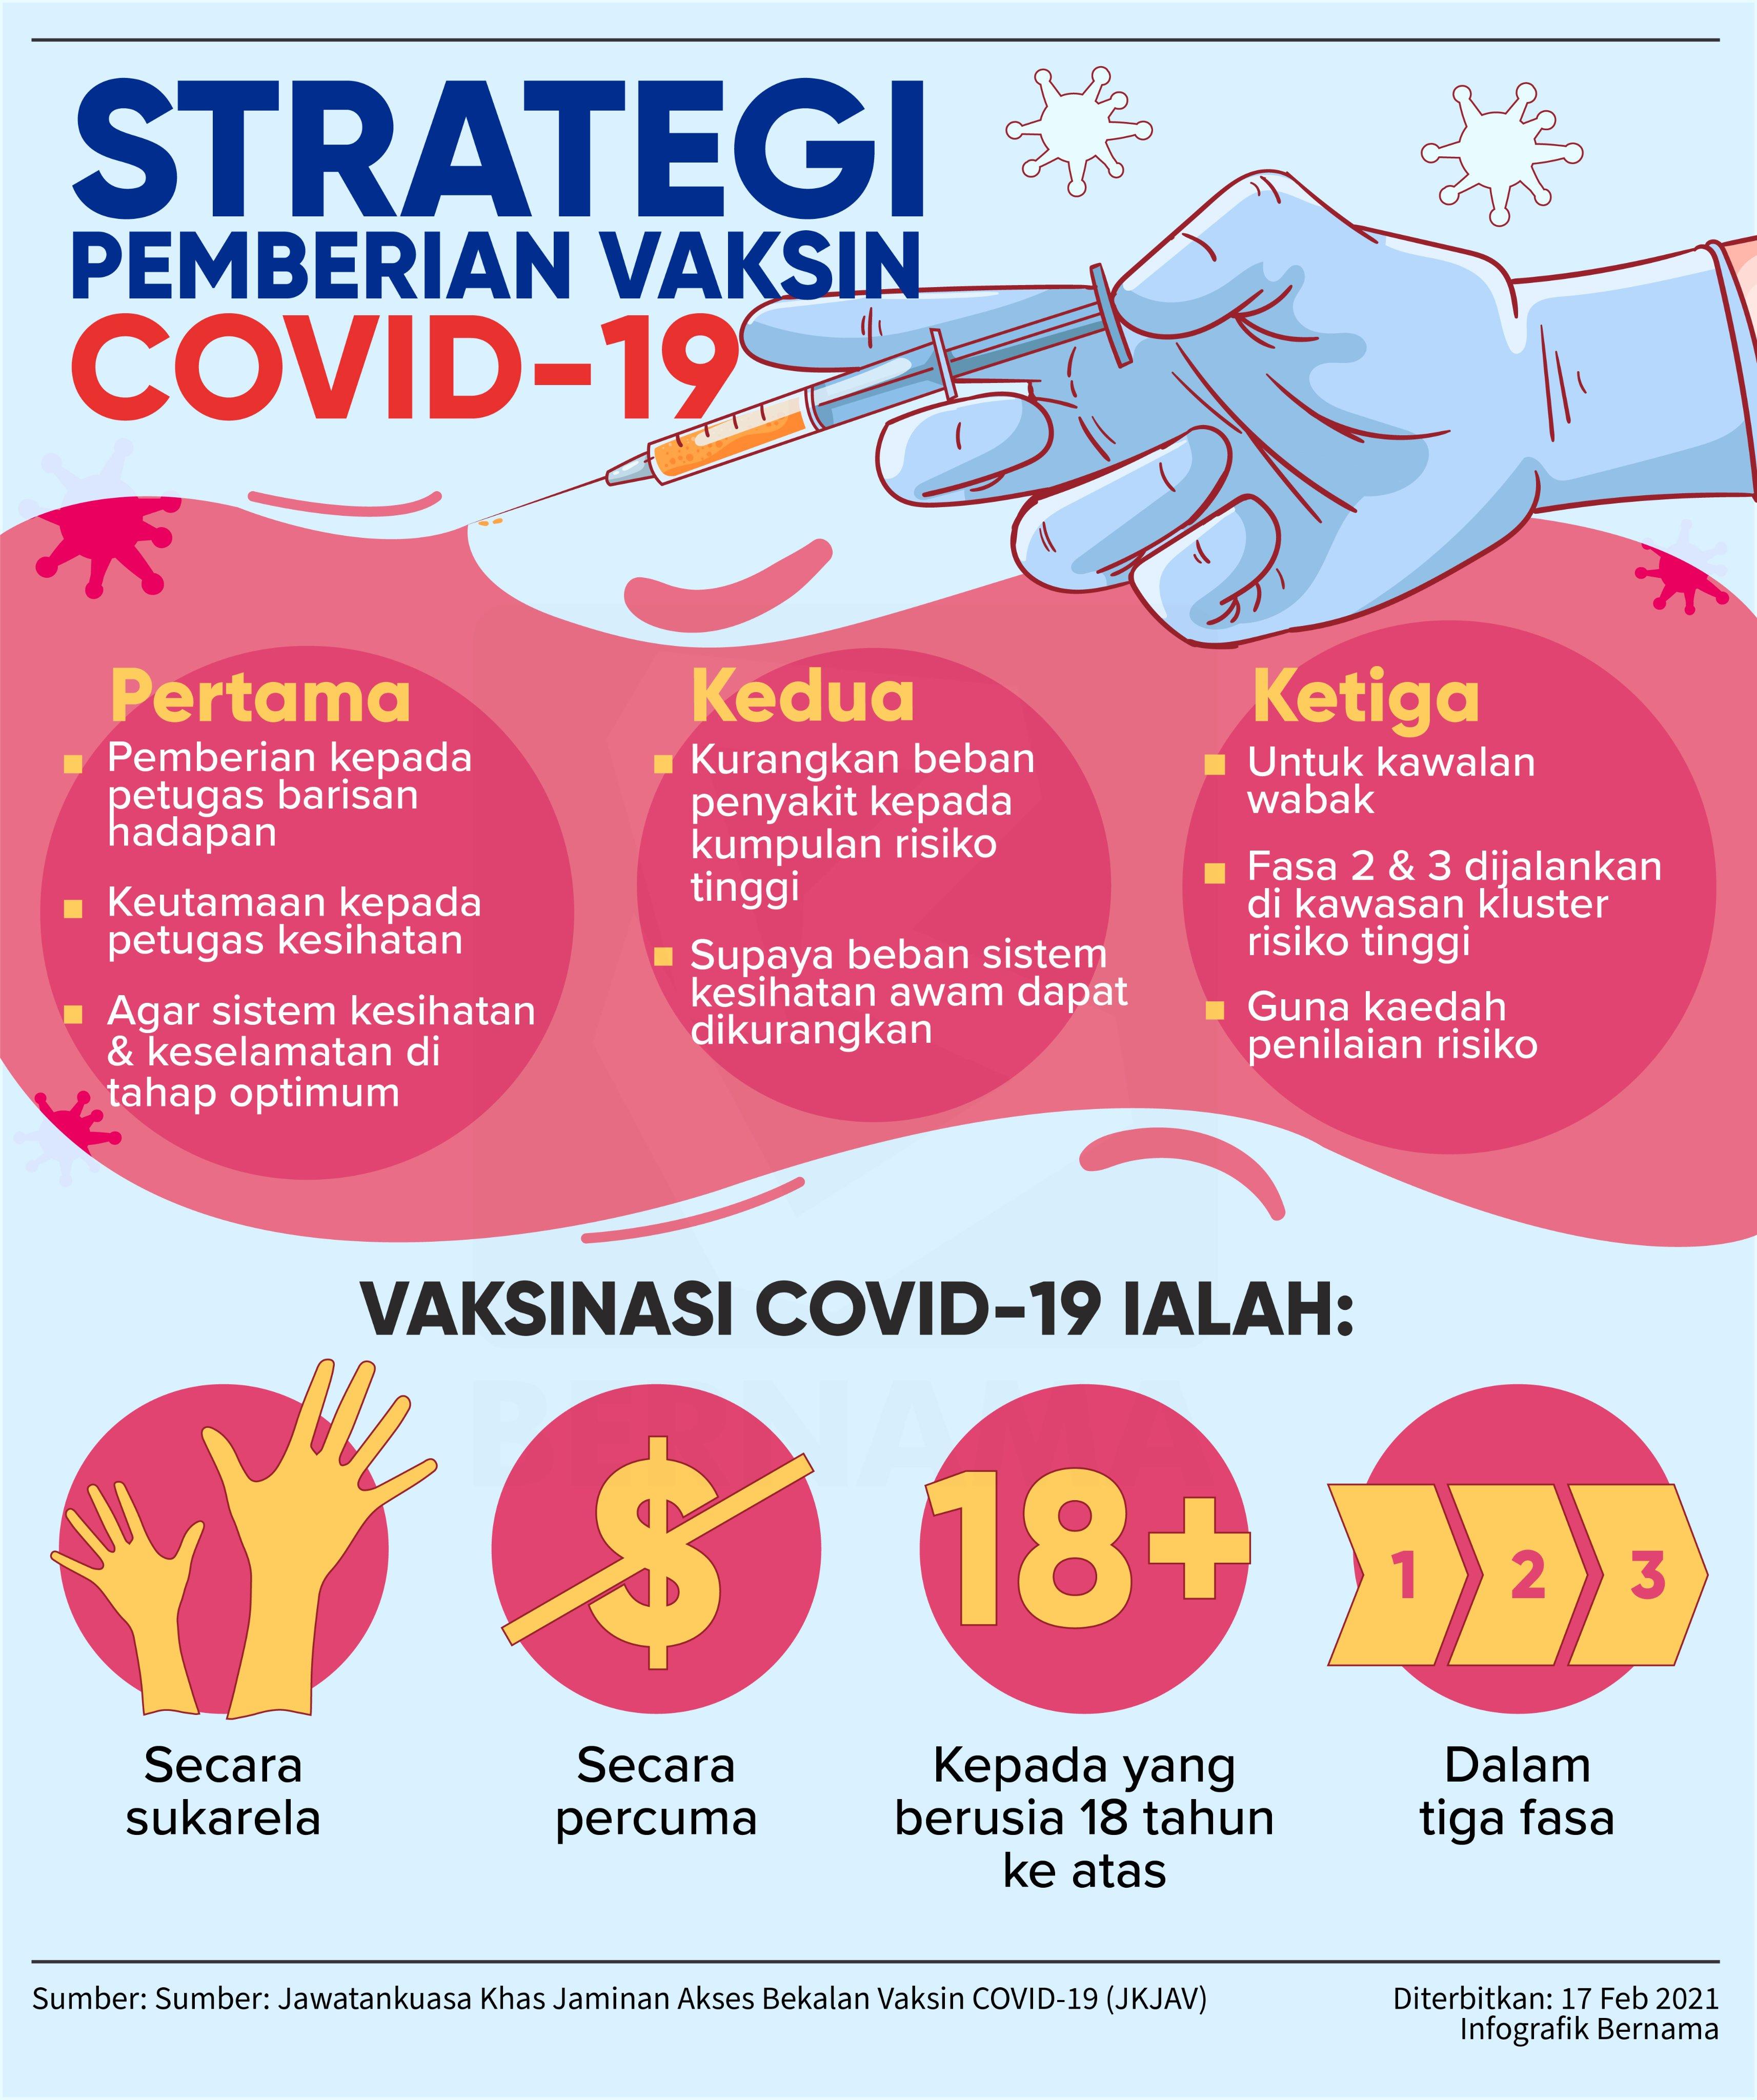 Vaksin Covid 19 Info Info Penting Tentang Pemberian Vaksin Covid 19 Di Malaysia Foodie